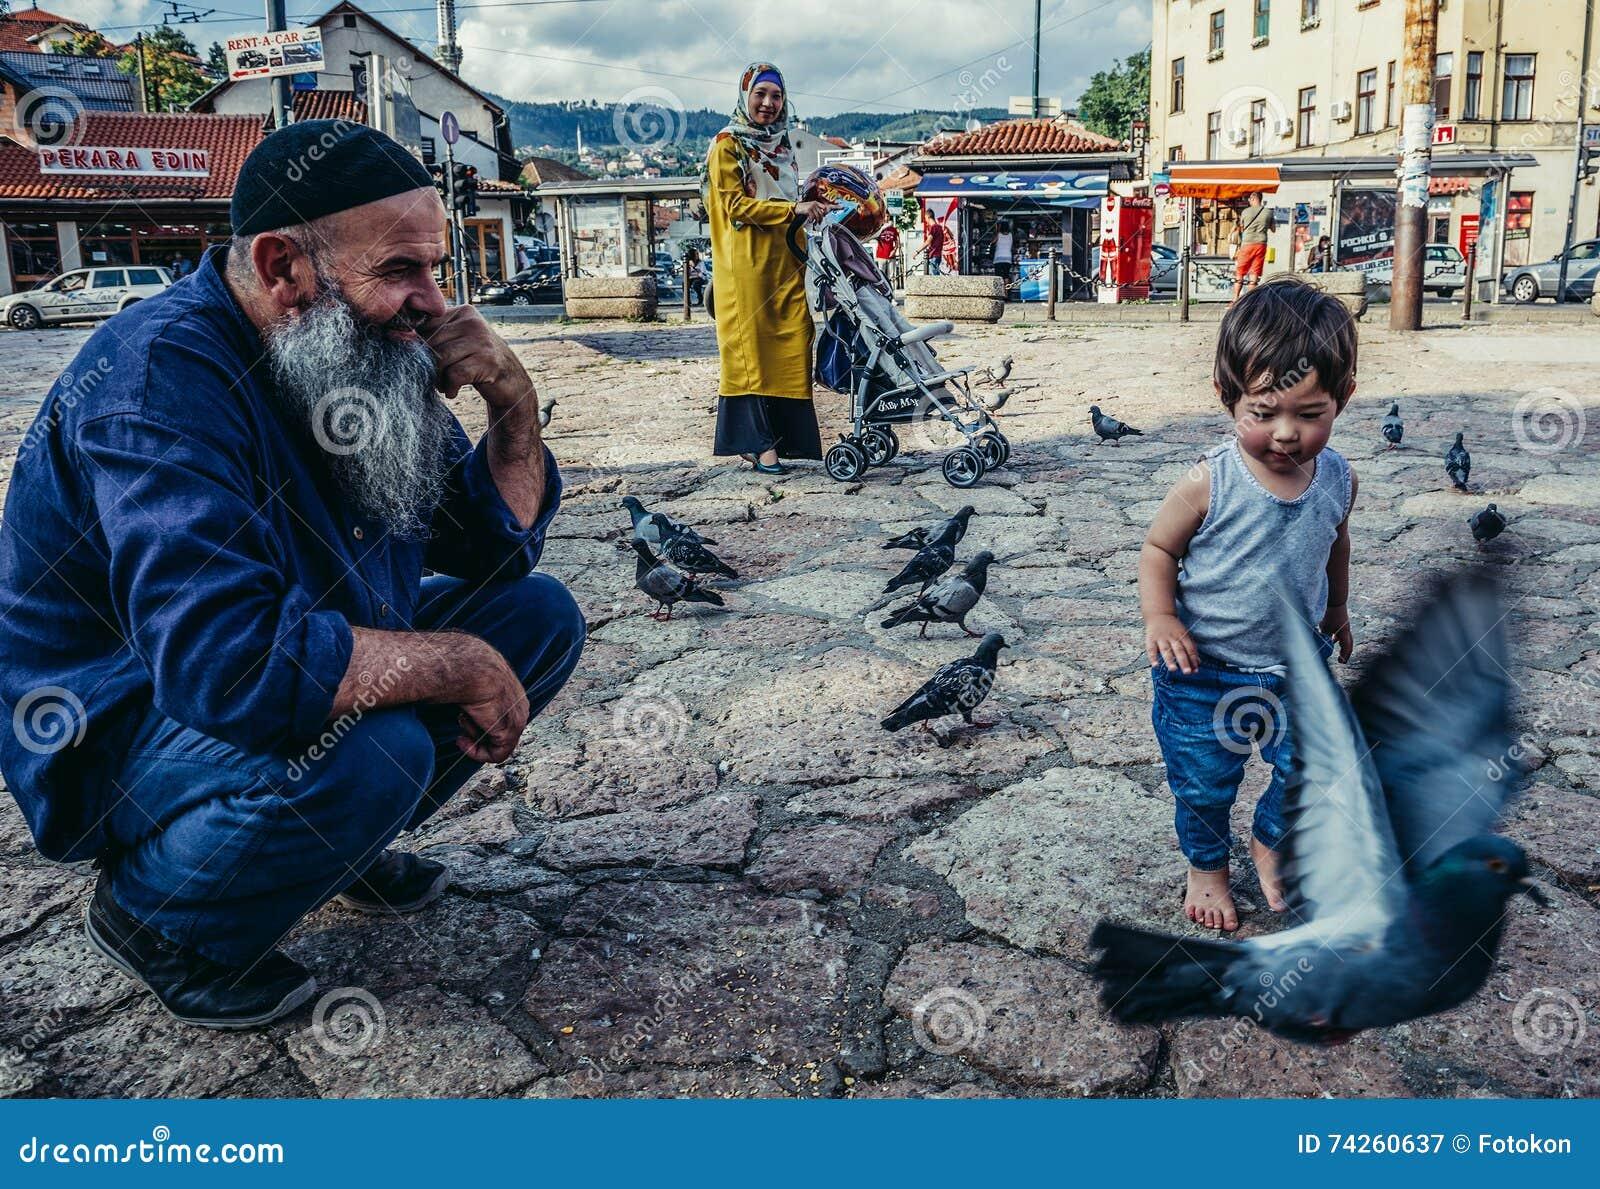 People in Sarajevo